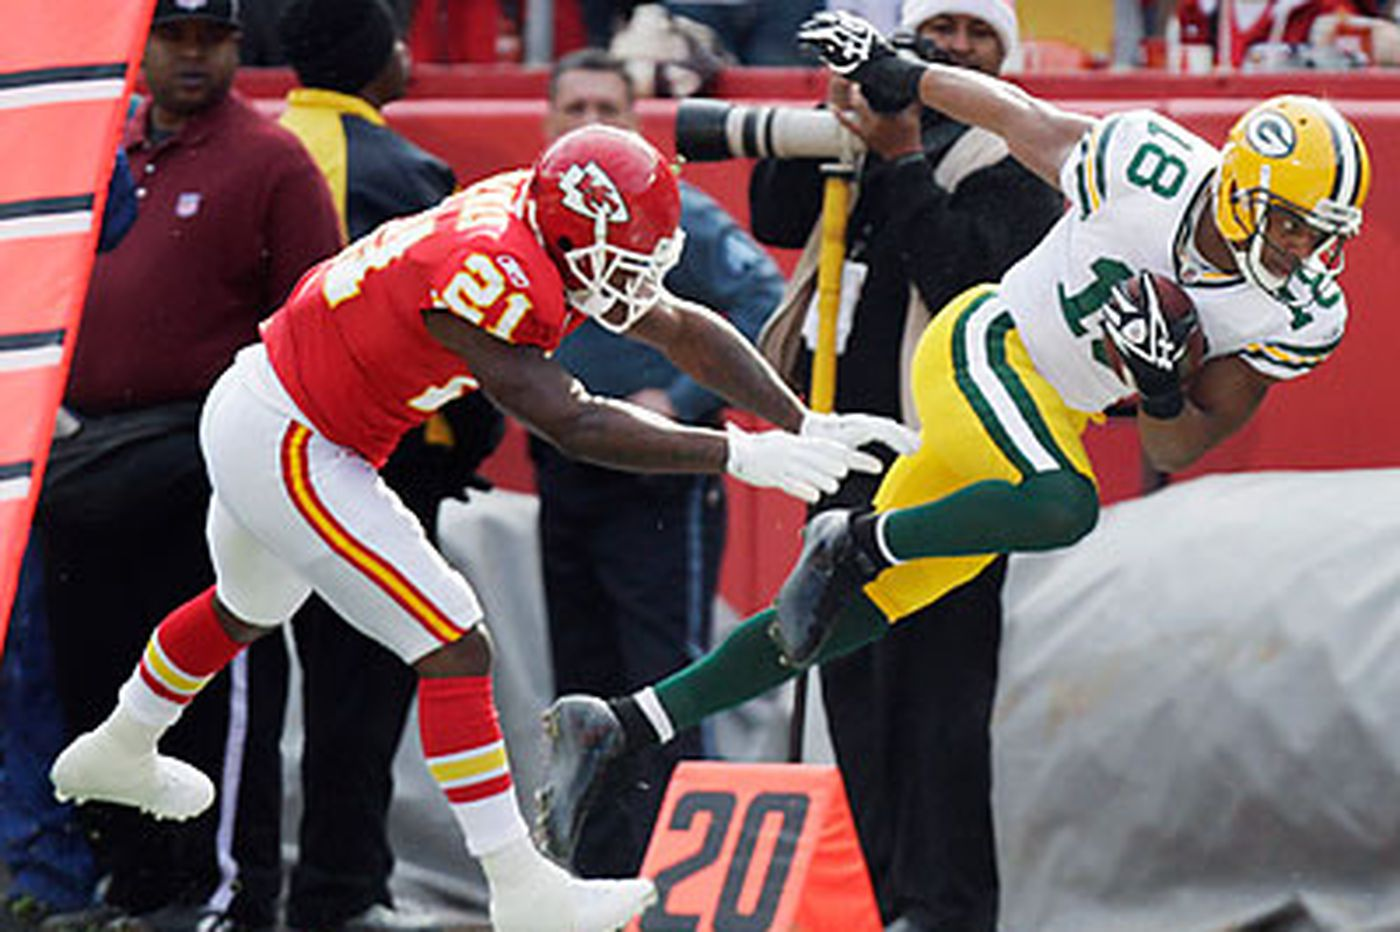 Chiefs pull monster upset of Pack